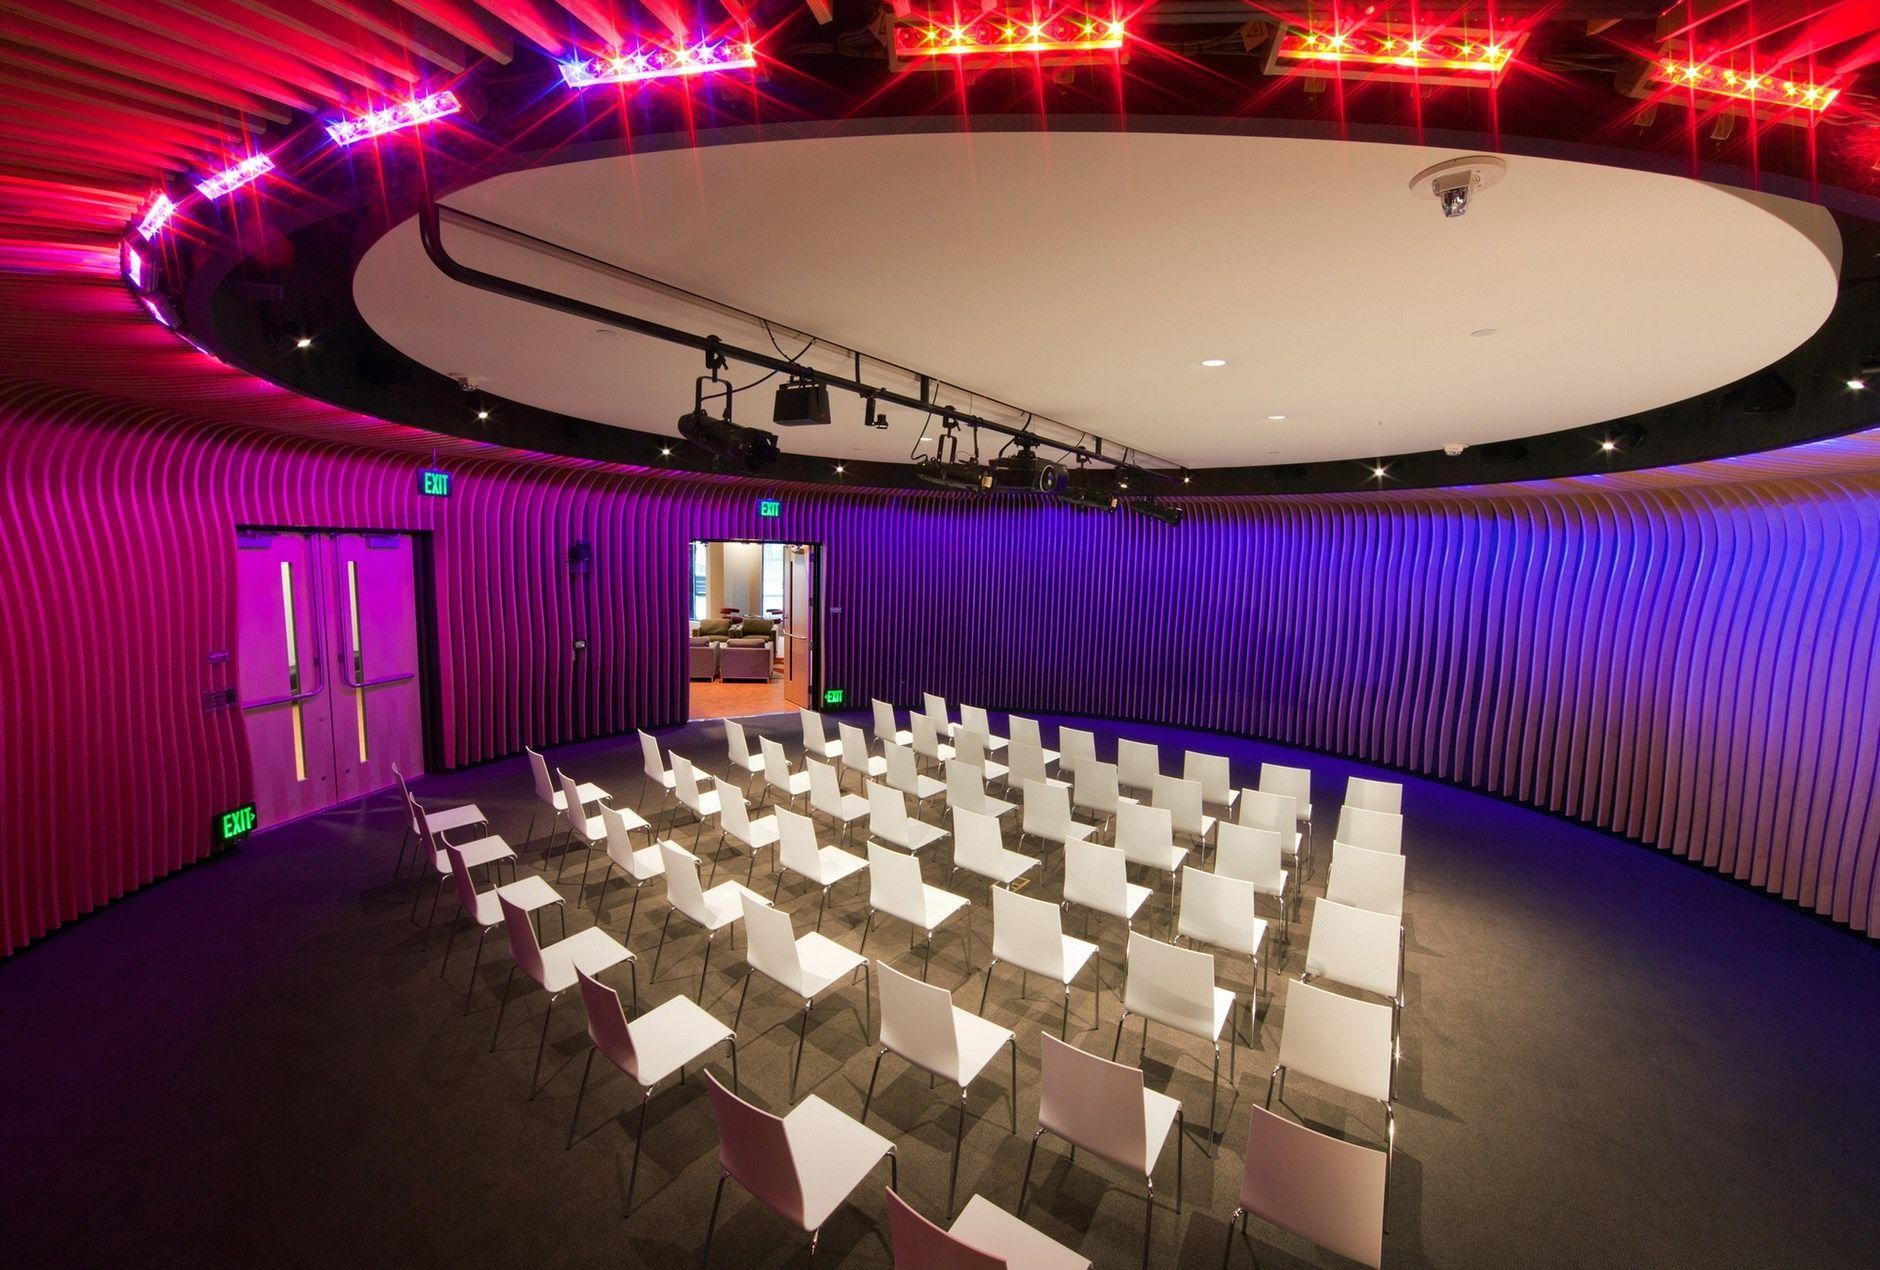 The Bechtel Conference Center